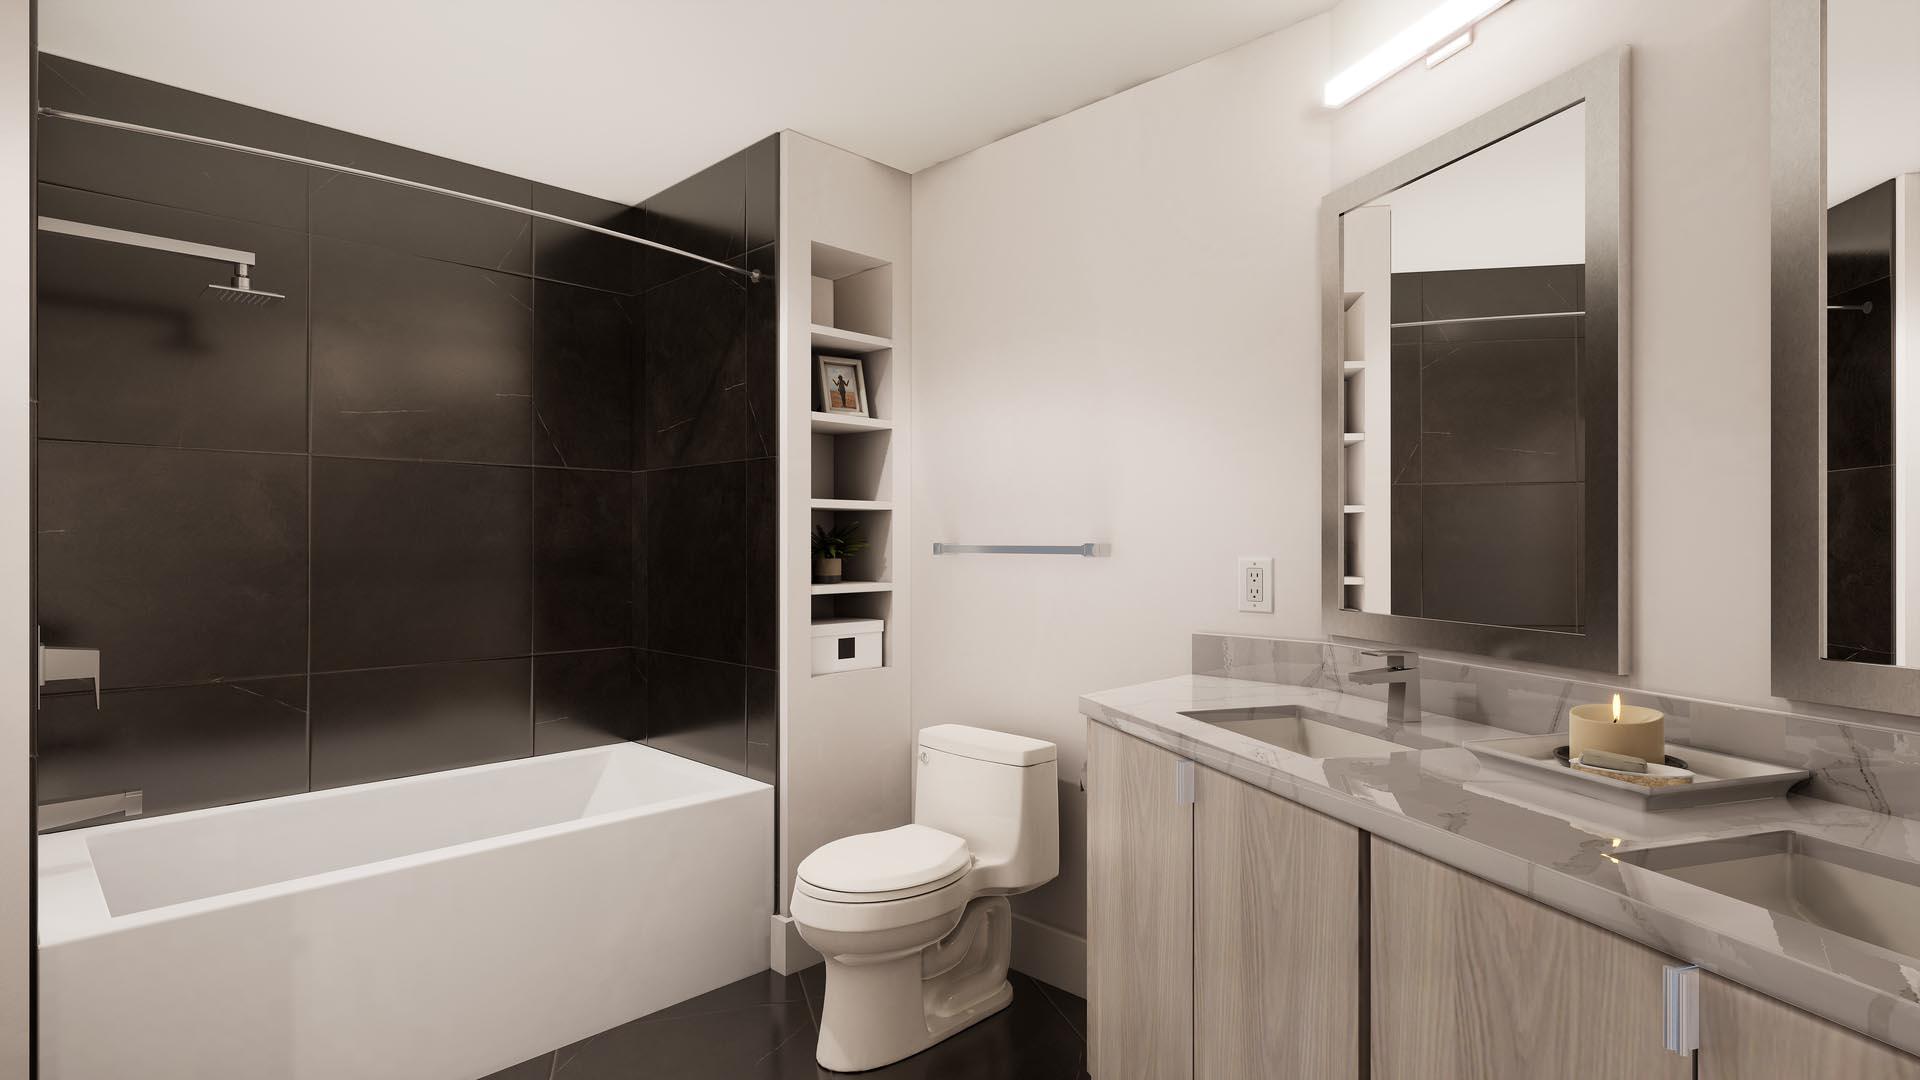 An apartment bathroom with finish option 2